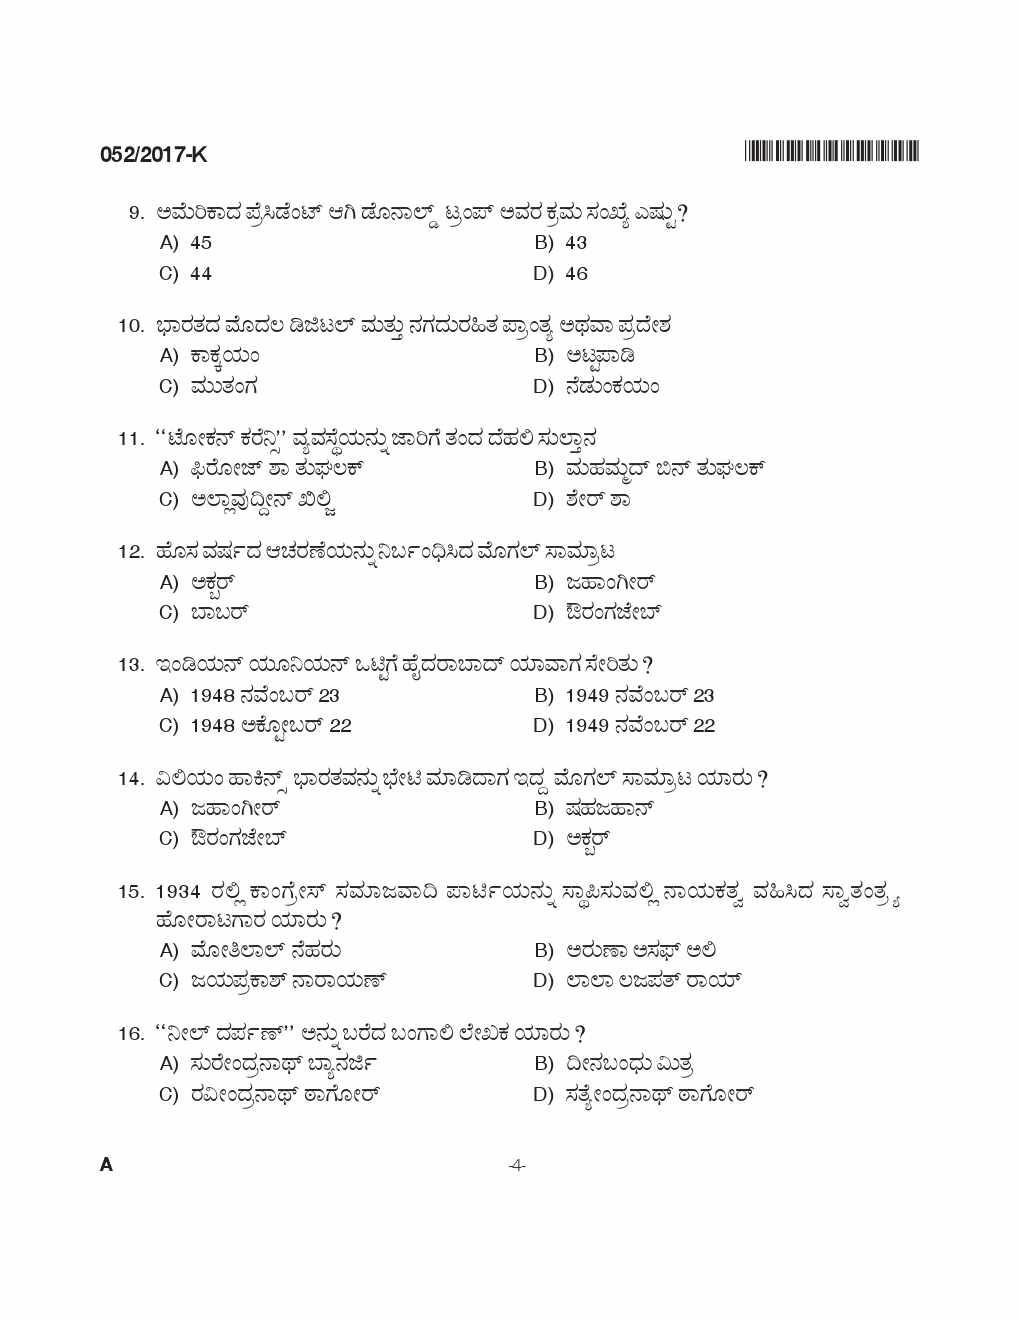 http://masterstudy.net//pdf/psc/women-police-constable-apb-police-question-paper-kannada/q_0522017-k0004.jpg